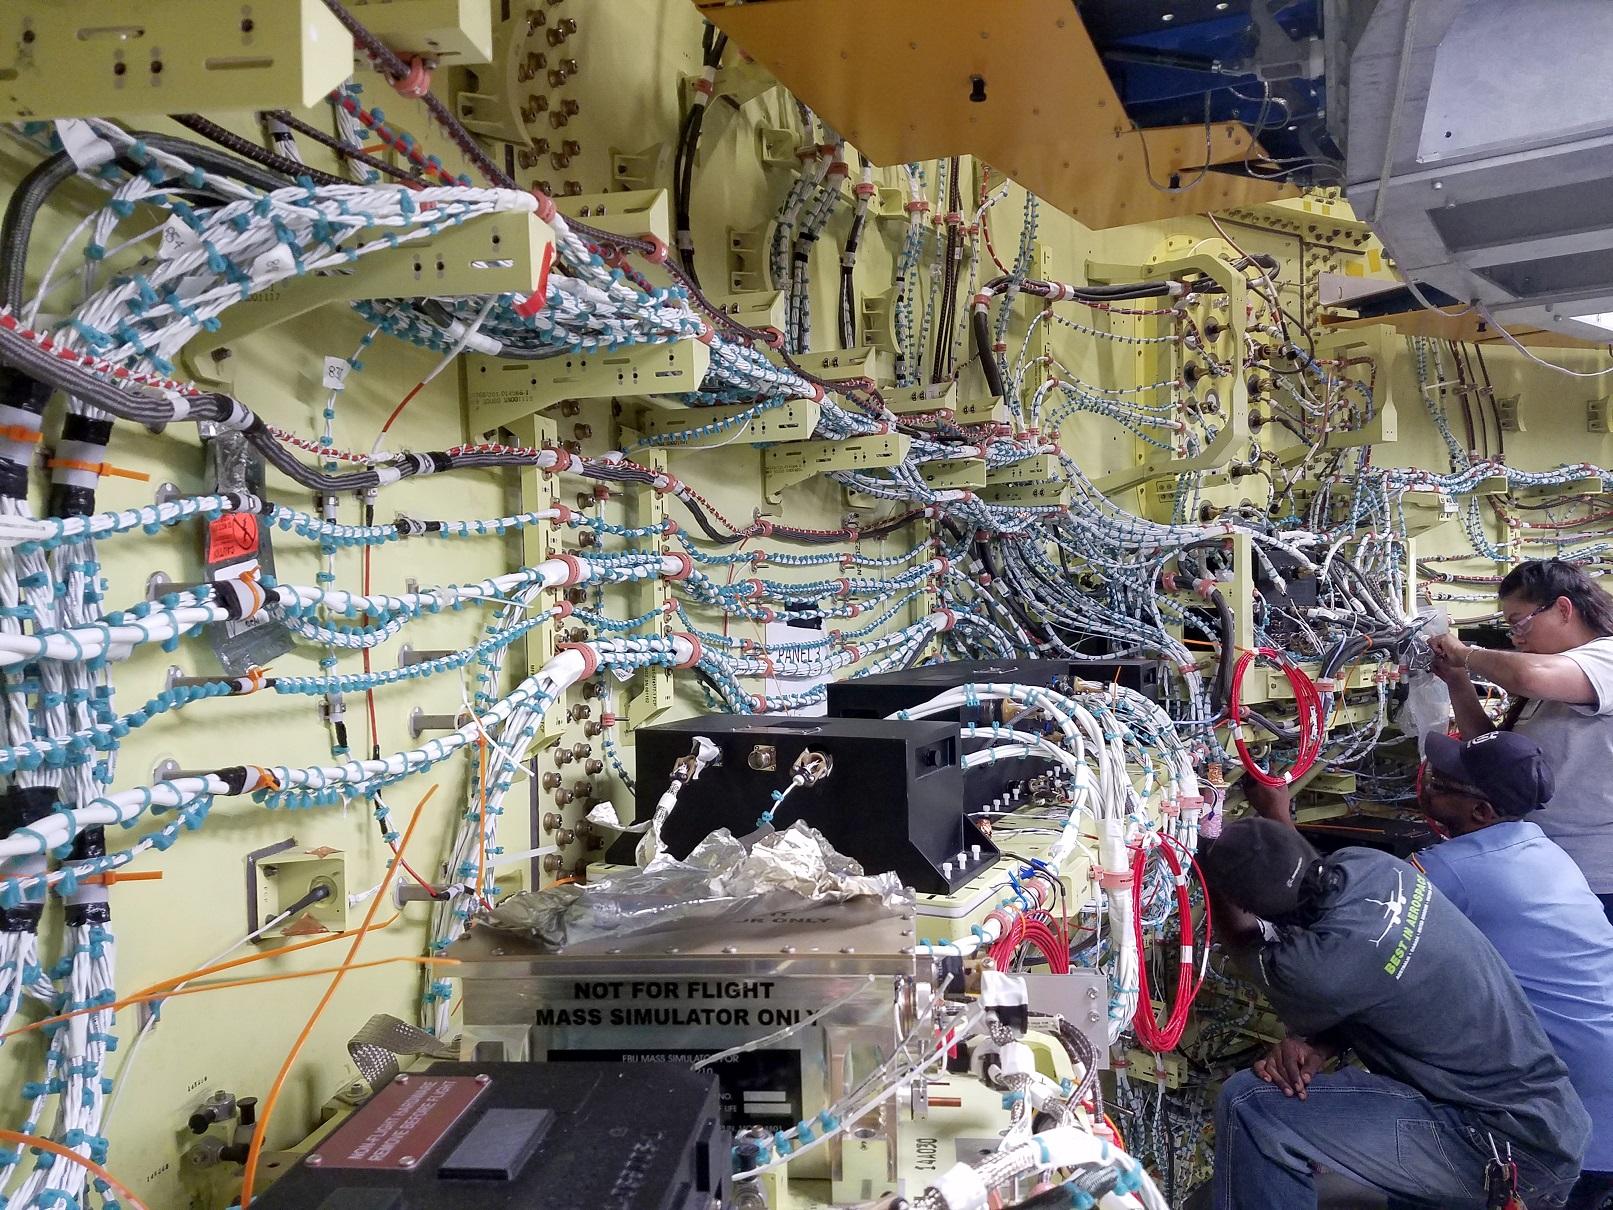 boeing wiring harness boeing wiring harness aircraft wire harness assembly aircraft  boeing wiring harness aircraft wire